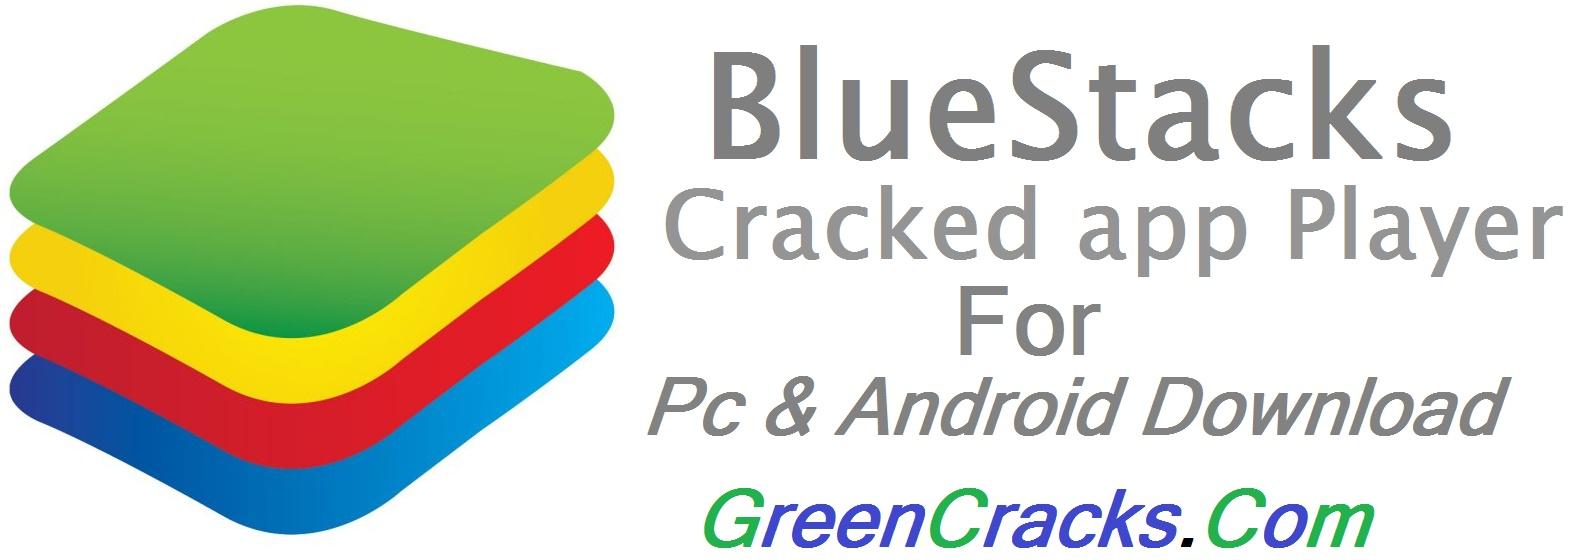 BlueStacks Cracked